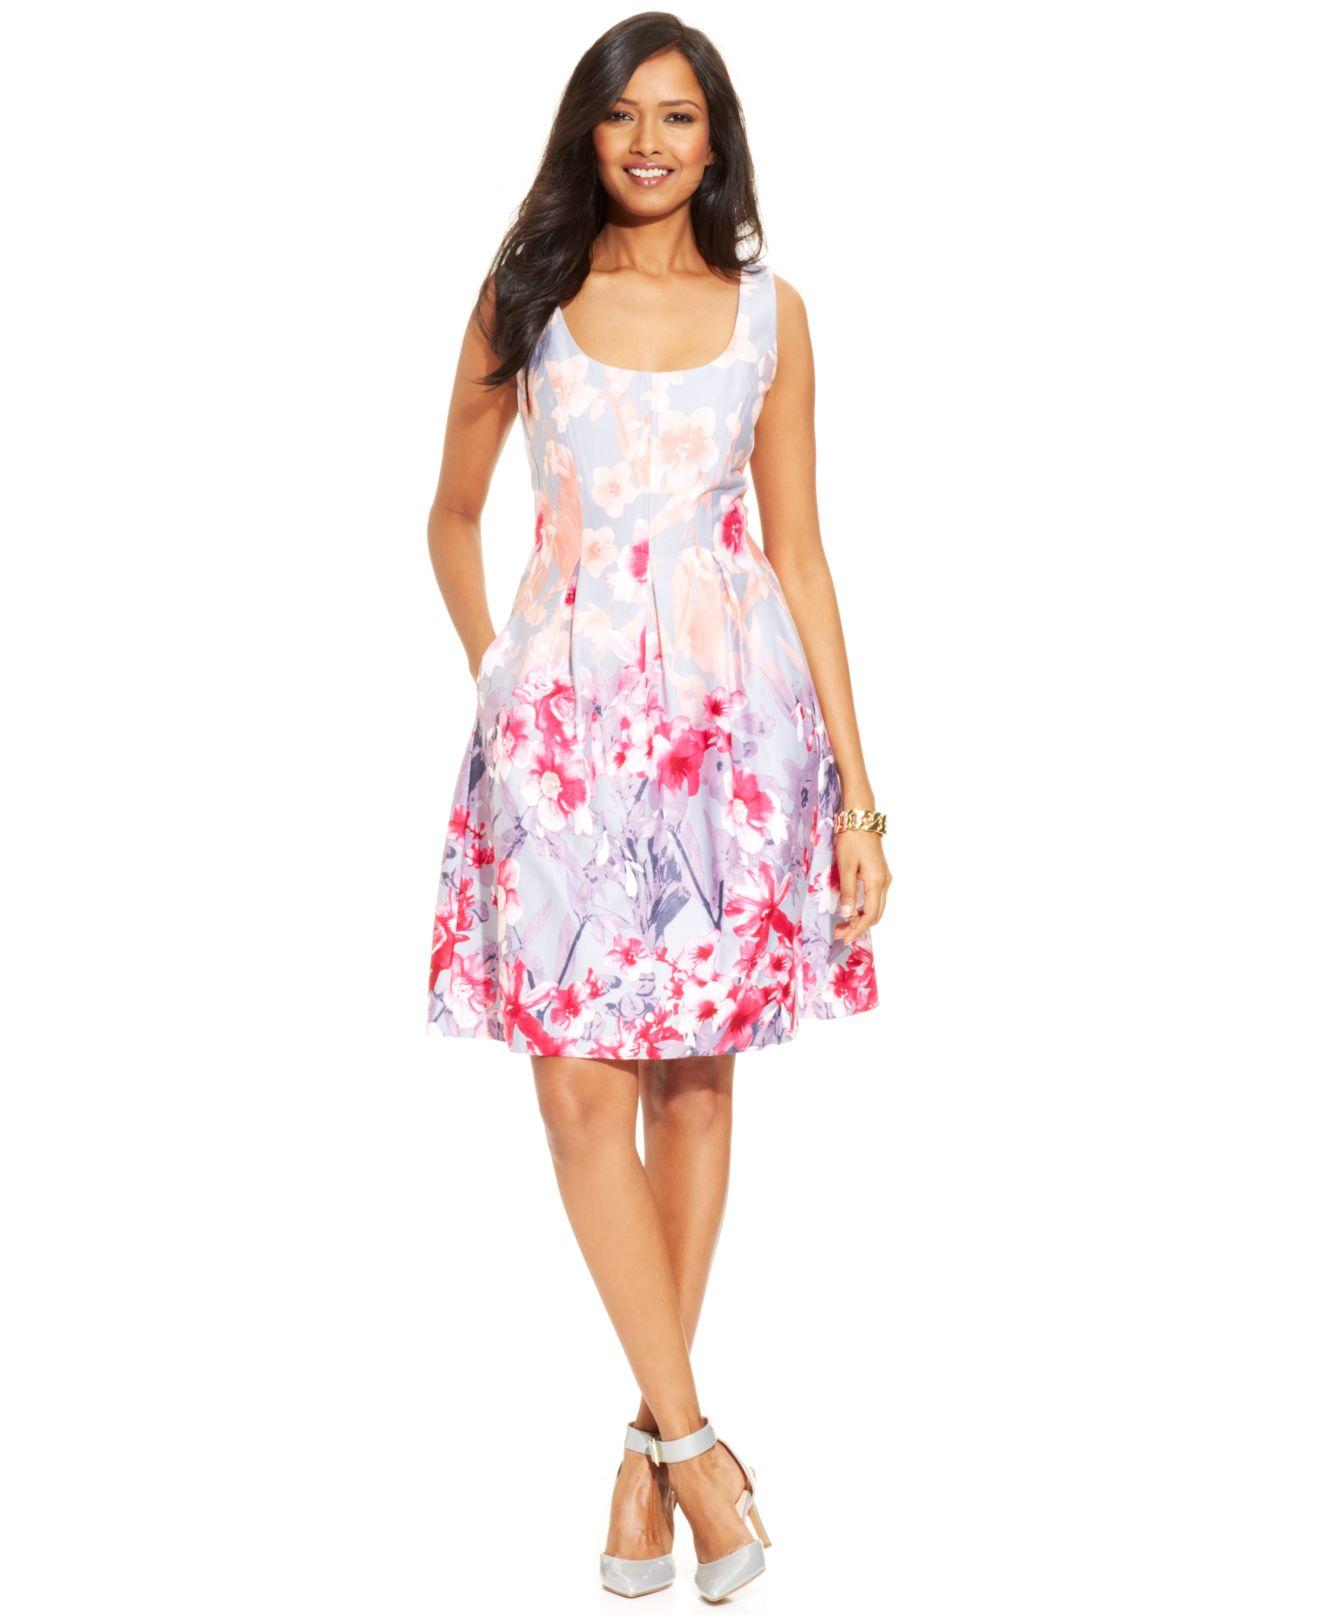 c033ac6311cc8 Lyst - Nine West Floral-Print Pleated Dress